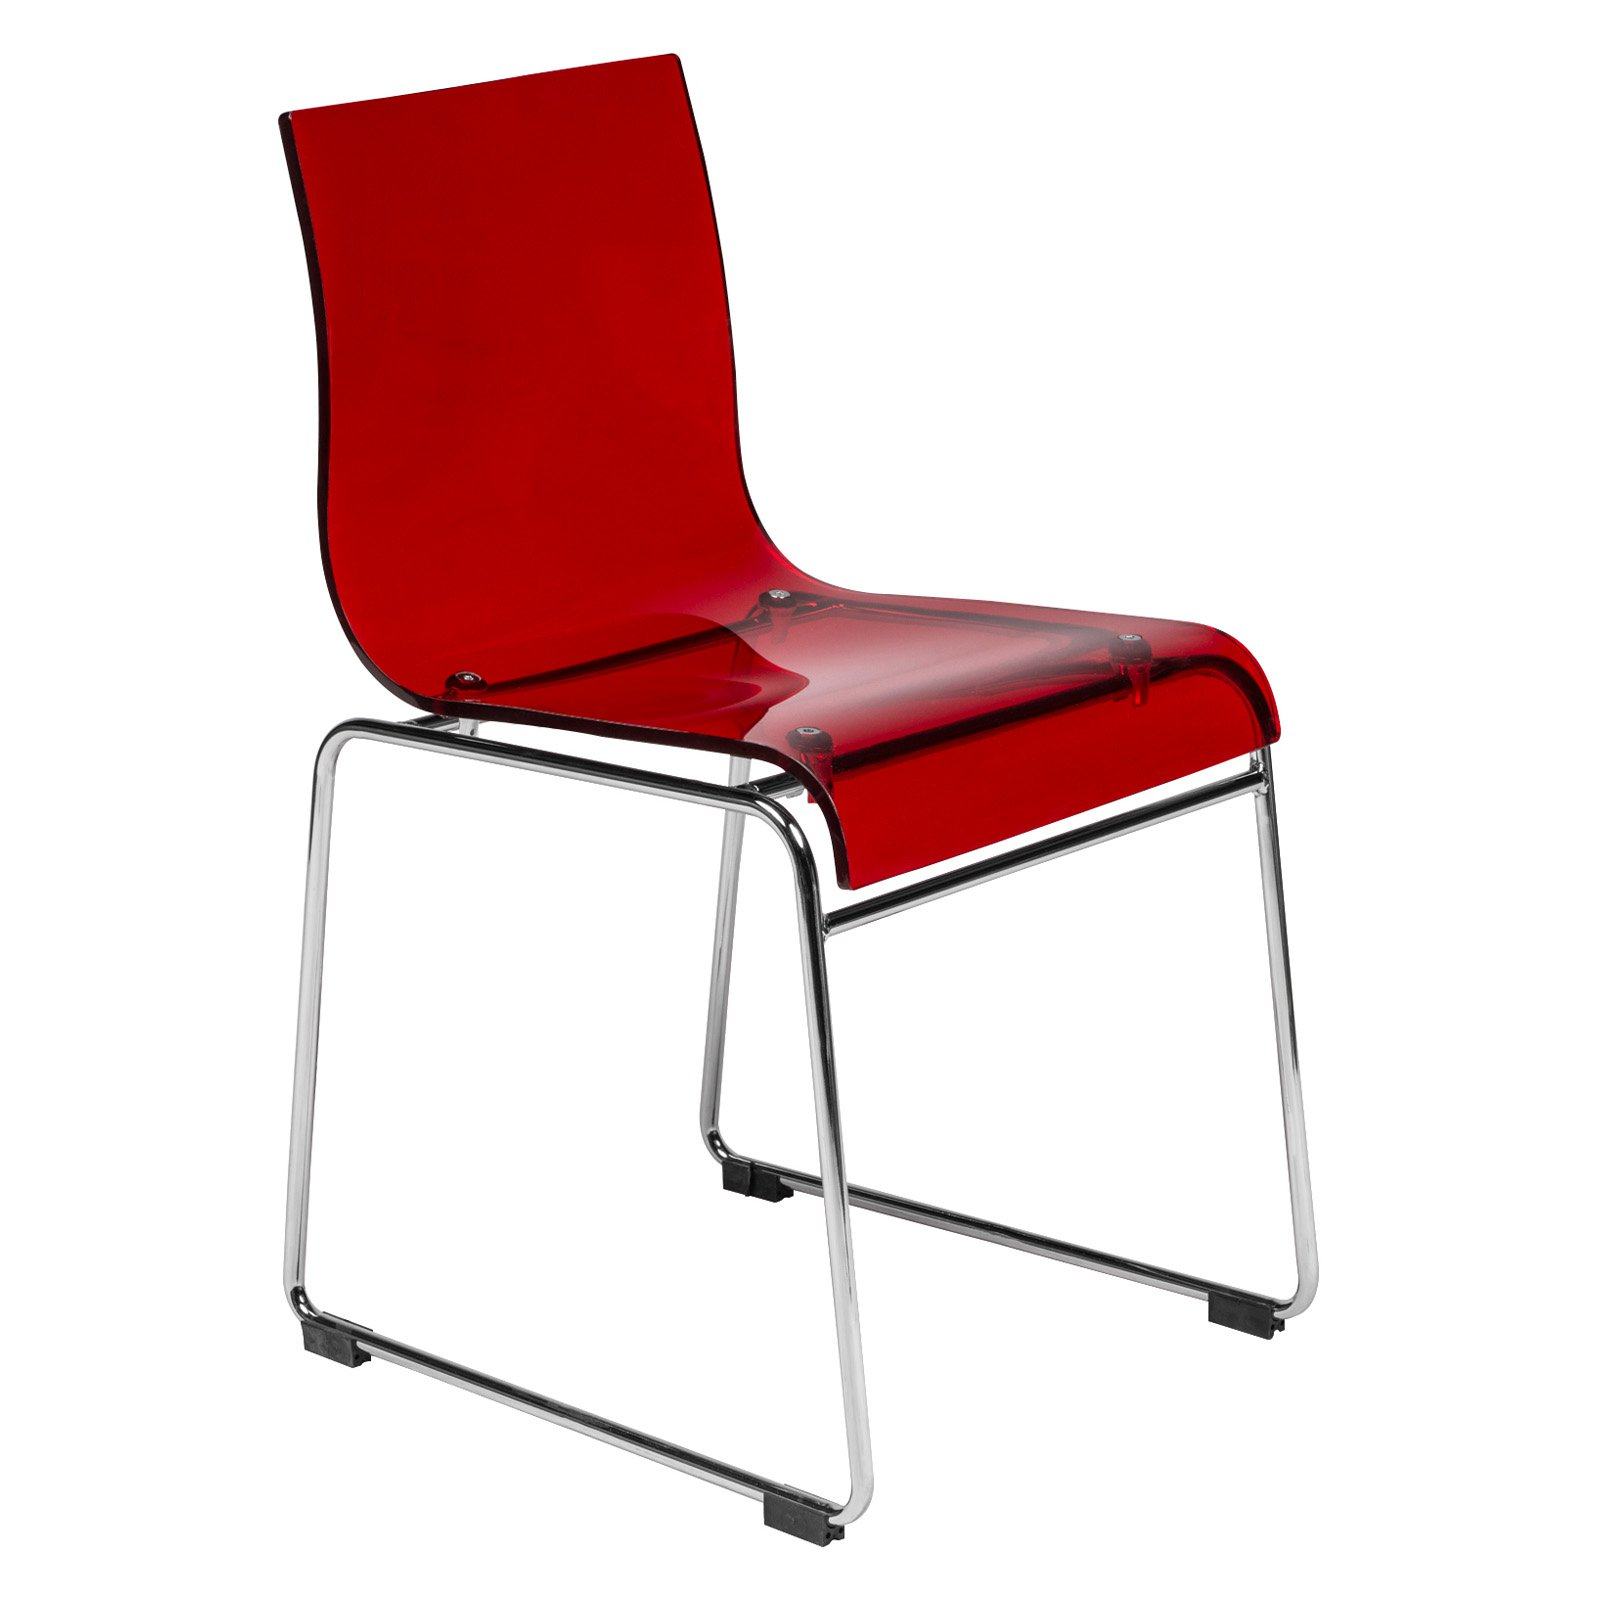 acrylic side chair with cushion arhaus alex chairs leisuremod lima modern dining